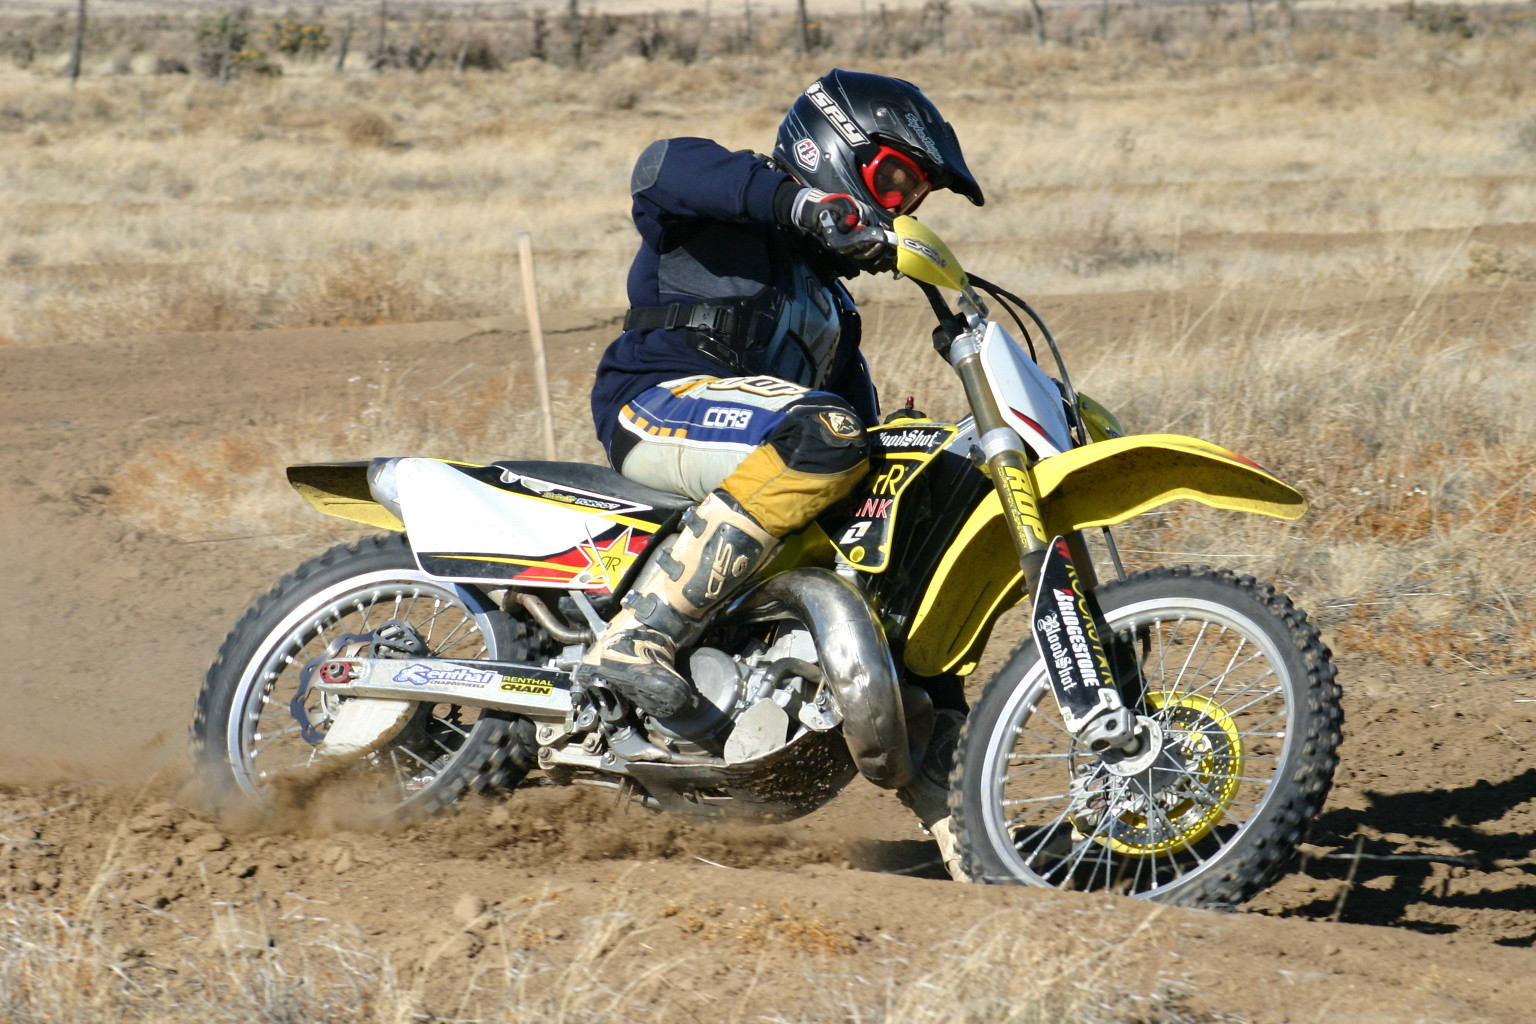 The Smoker At Cygnus's Track - jtomasik - Motocross Pictures - Vital MX